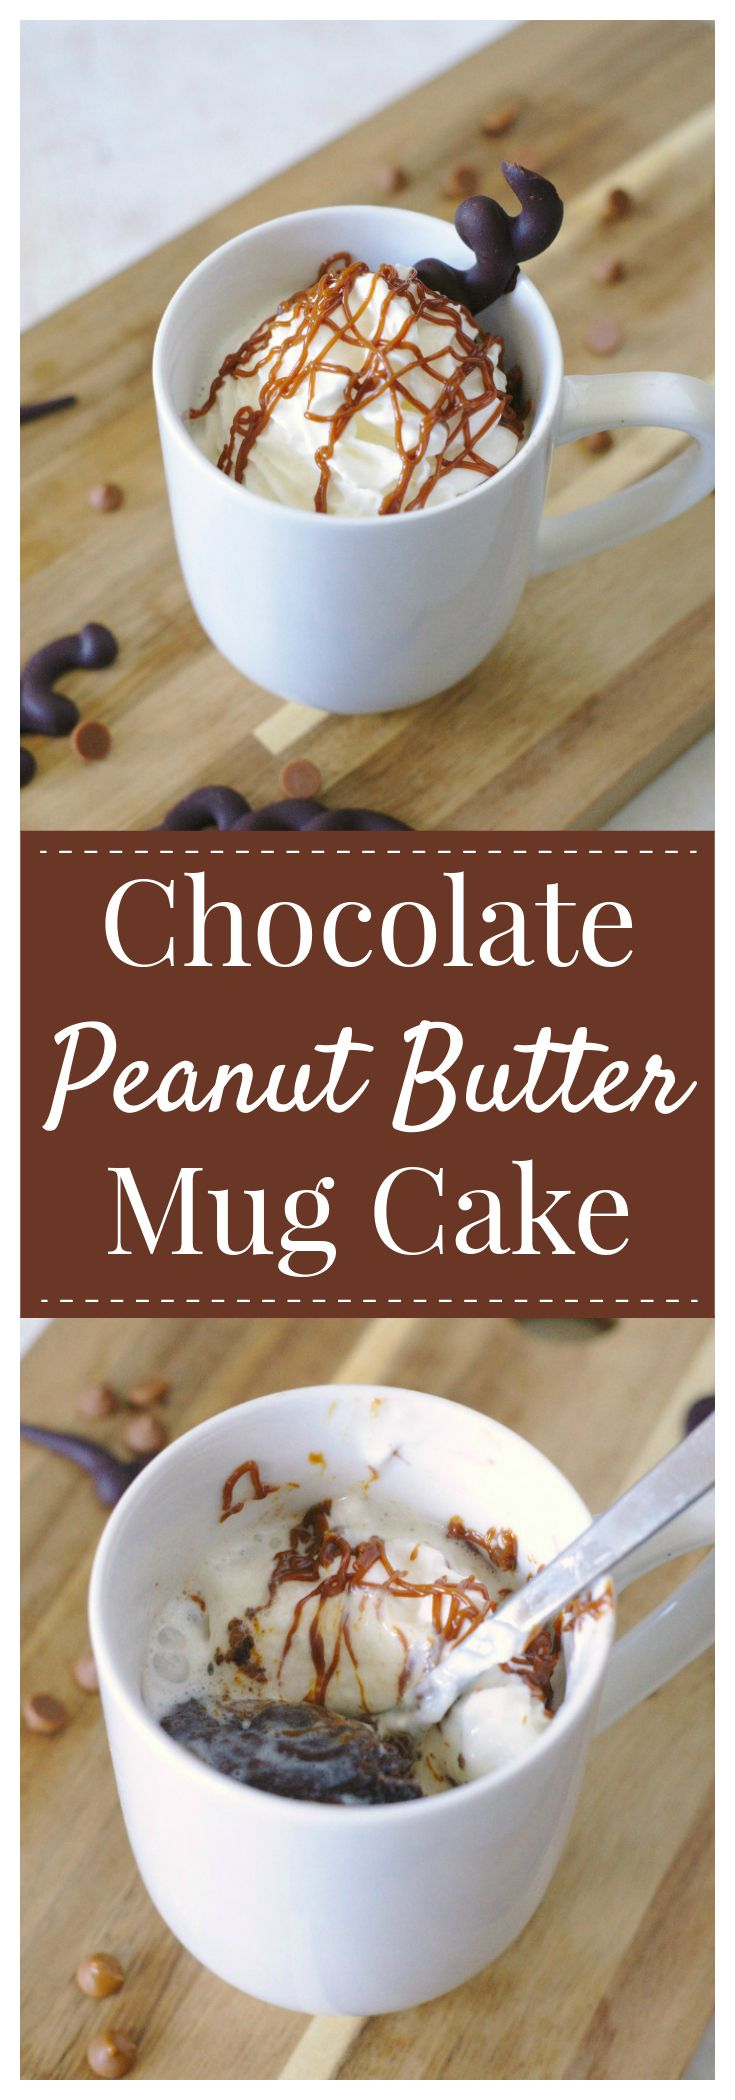 Chocolate Peanut Butter Mug Cake – an indulgent single serving dessert ready in just minutes! Peanut butter chocolate cake batter topped with whipped cream and peanut butter! #choctoberfest #chocolate #peanutbutter #mug #cake #dessert